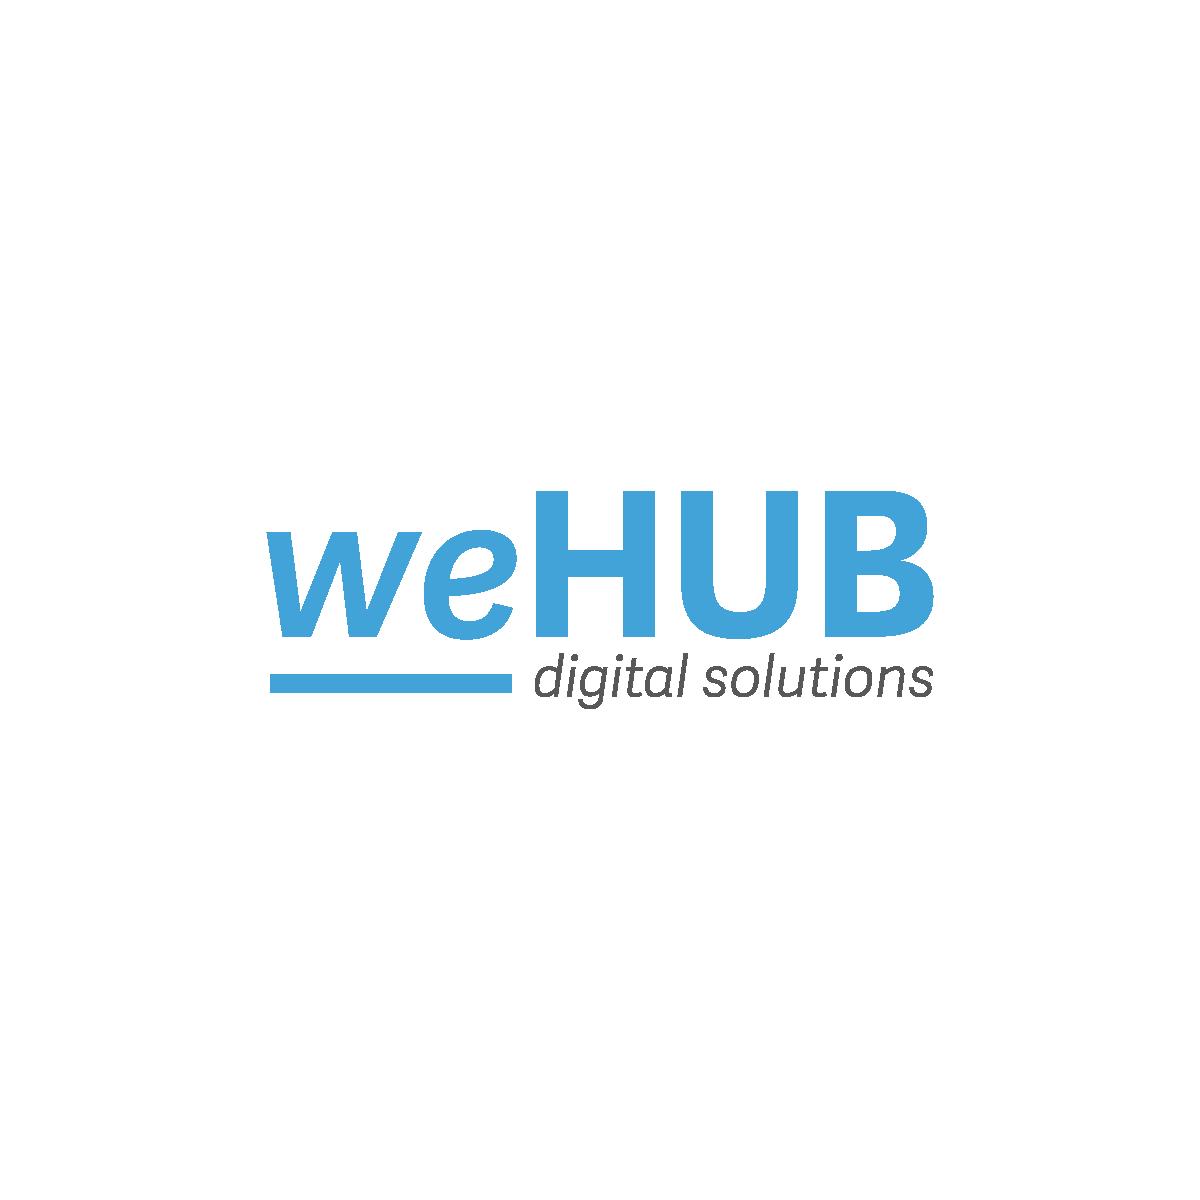 Logo weHUB